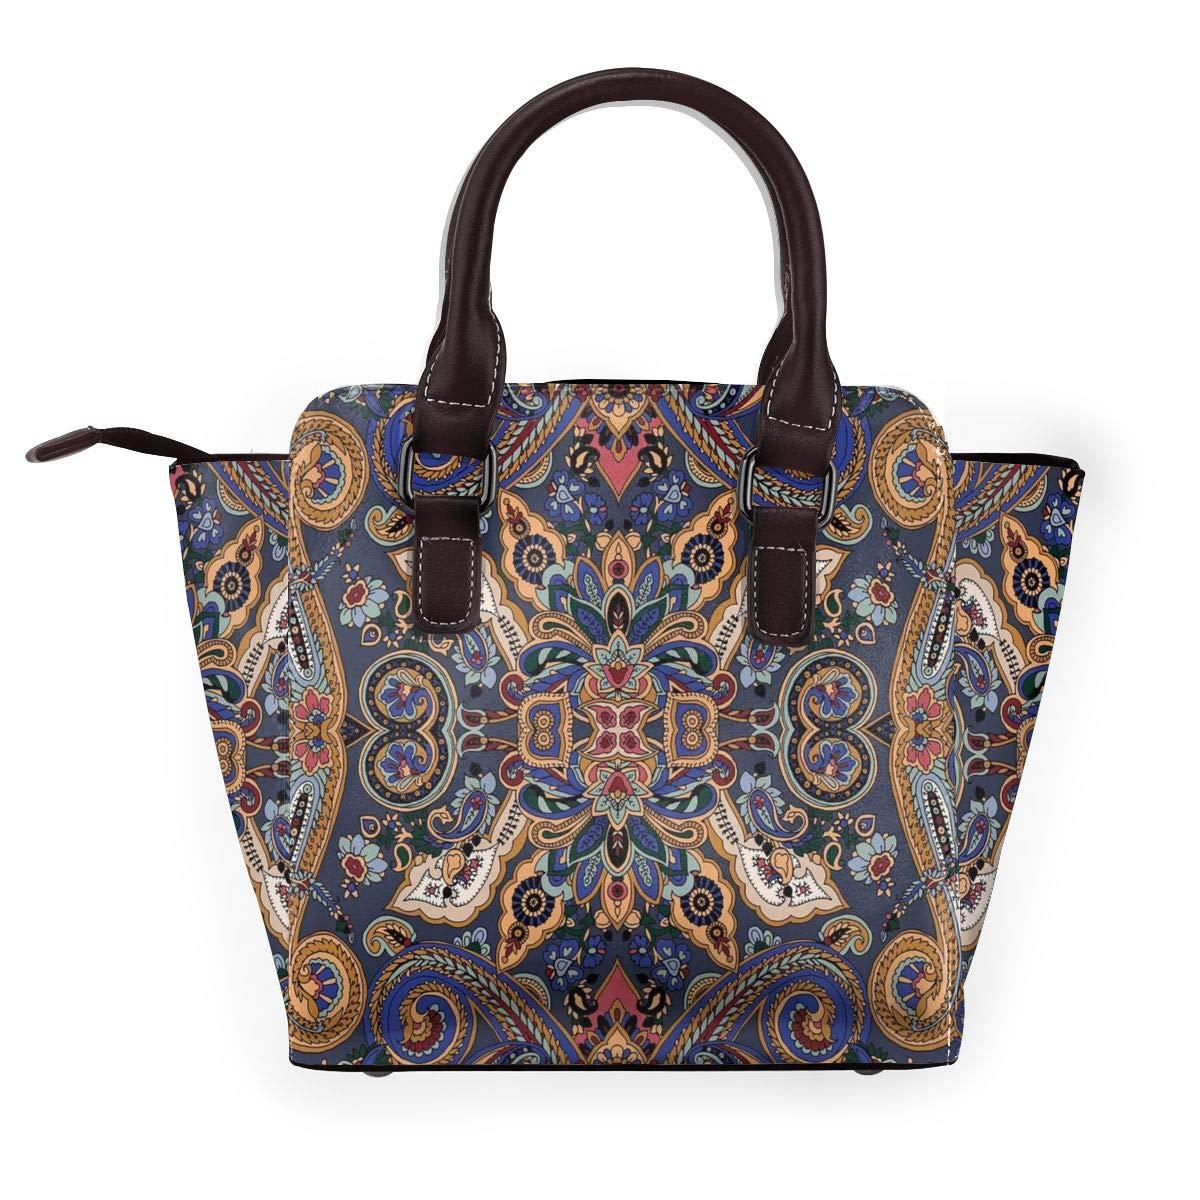 Timber Wolf dam exklusivt mode utsökt elegant äkta läder nit axelväska Moroccan Florets Slavic Effects